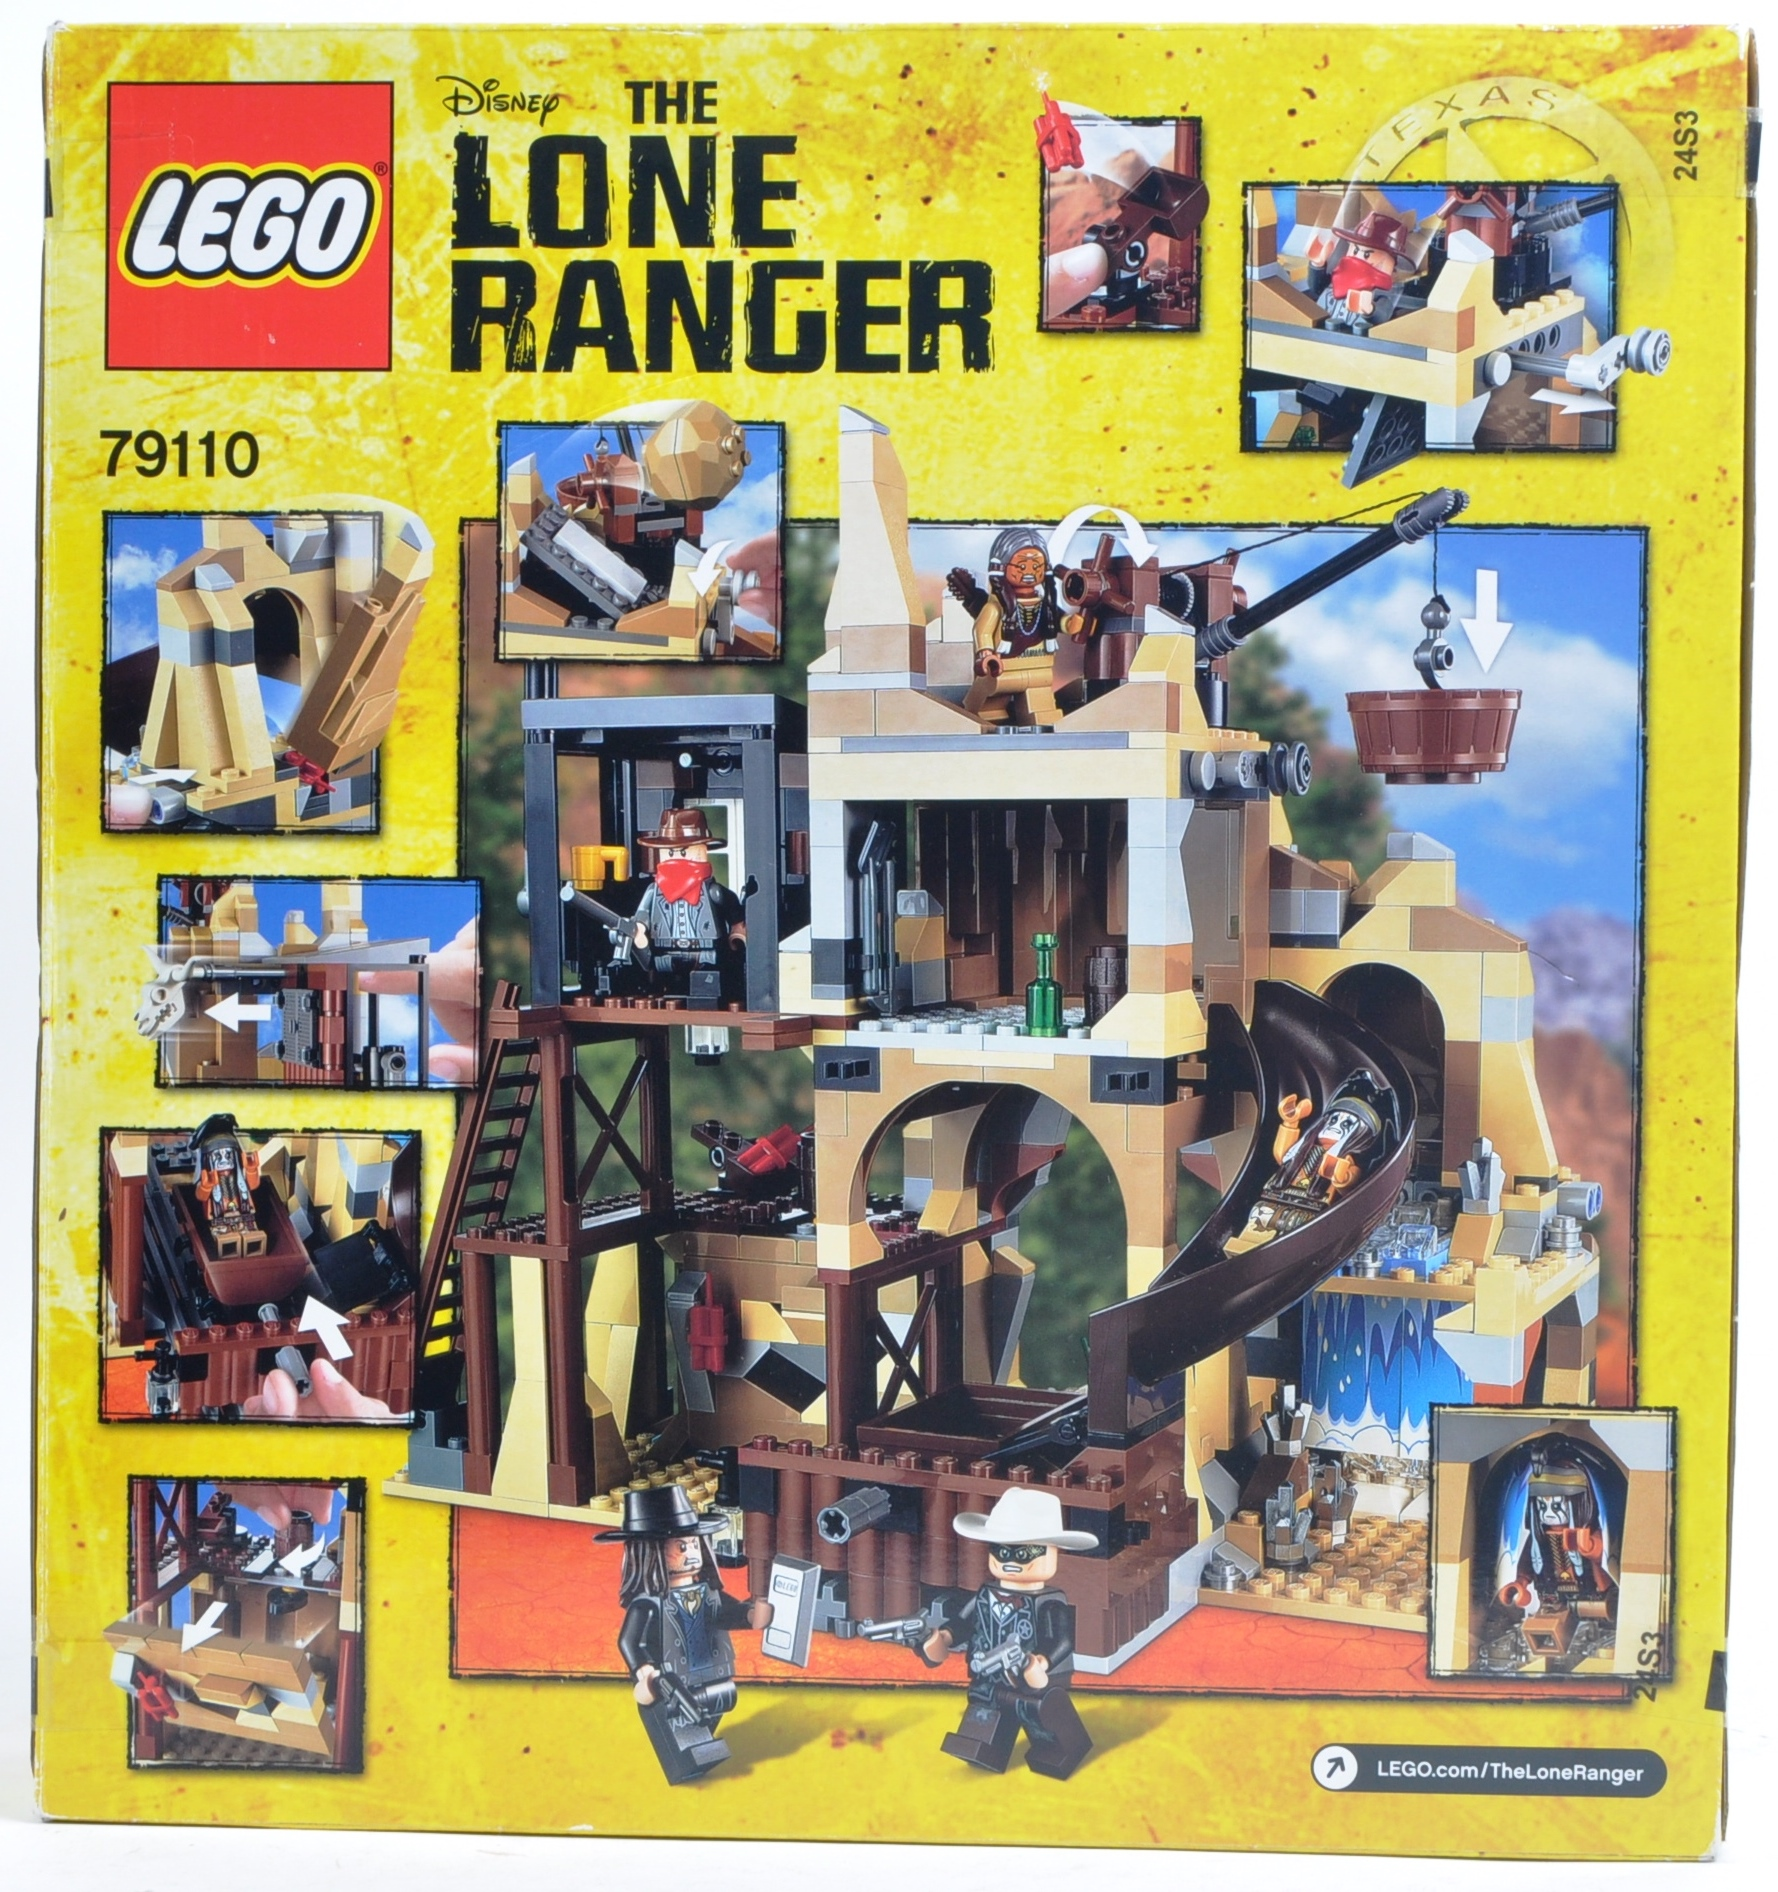 LEGO SET - THE LONE RANGER - 79110 - SILVER MINE SHOOTOUT - Image 2 of 4